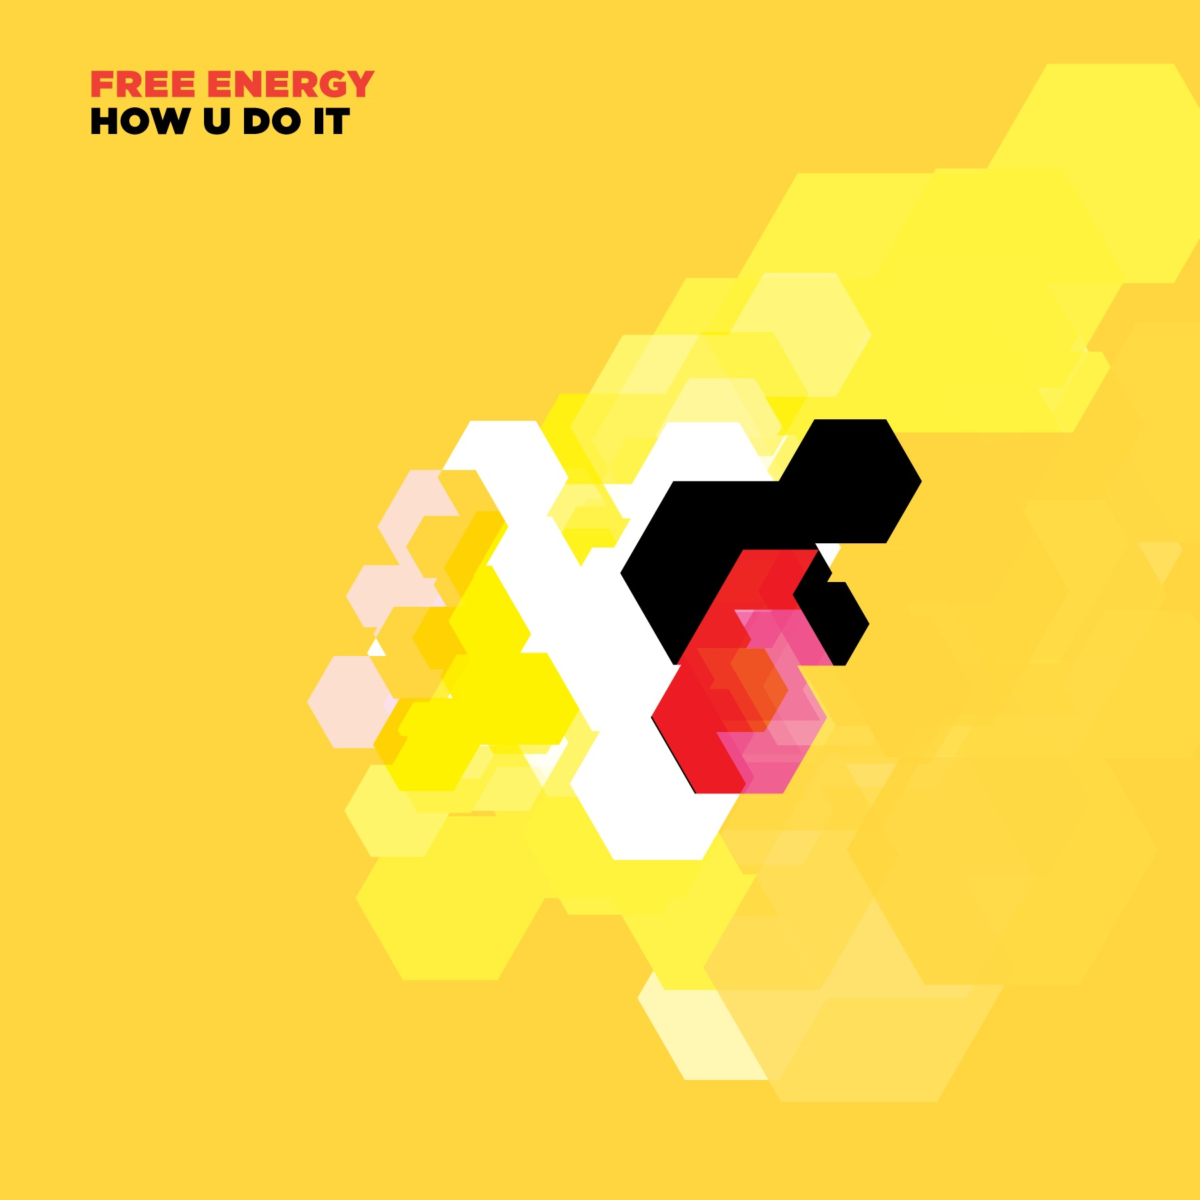 VIZ017 Free Energy - How U Do It